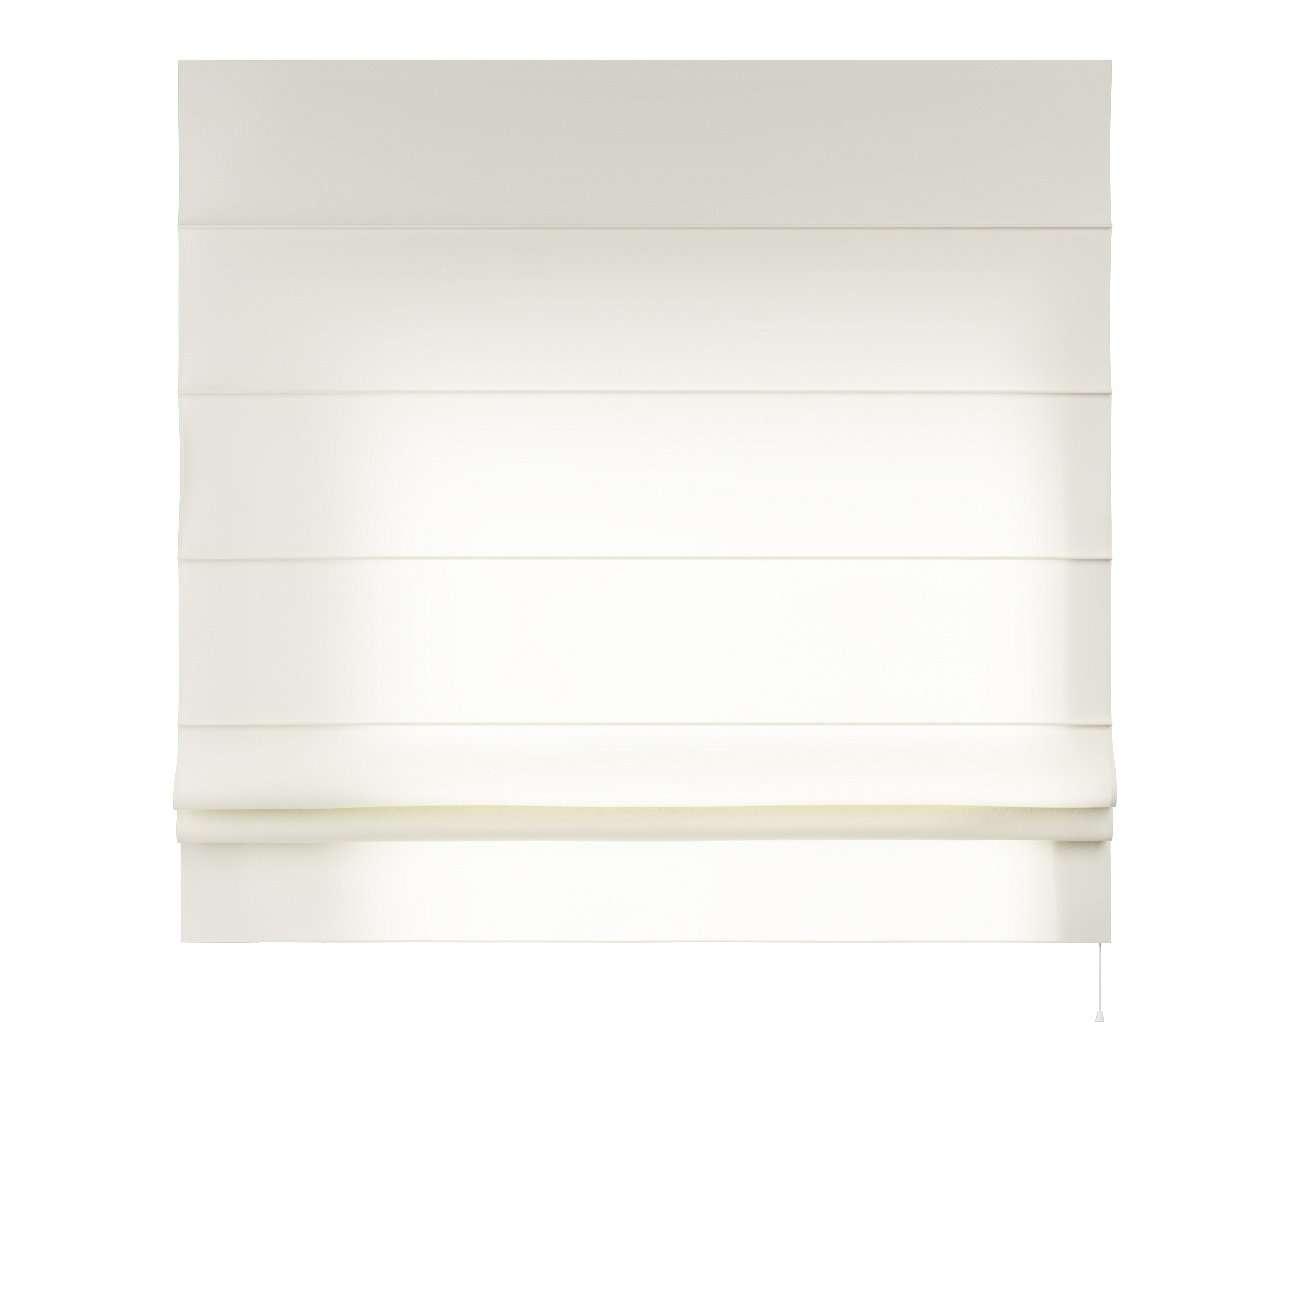 Romanetės Padva 80 x 170 cm (plotis x ilgis) kolekcijoje Jupiter, audinys: 127-00